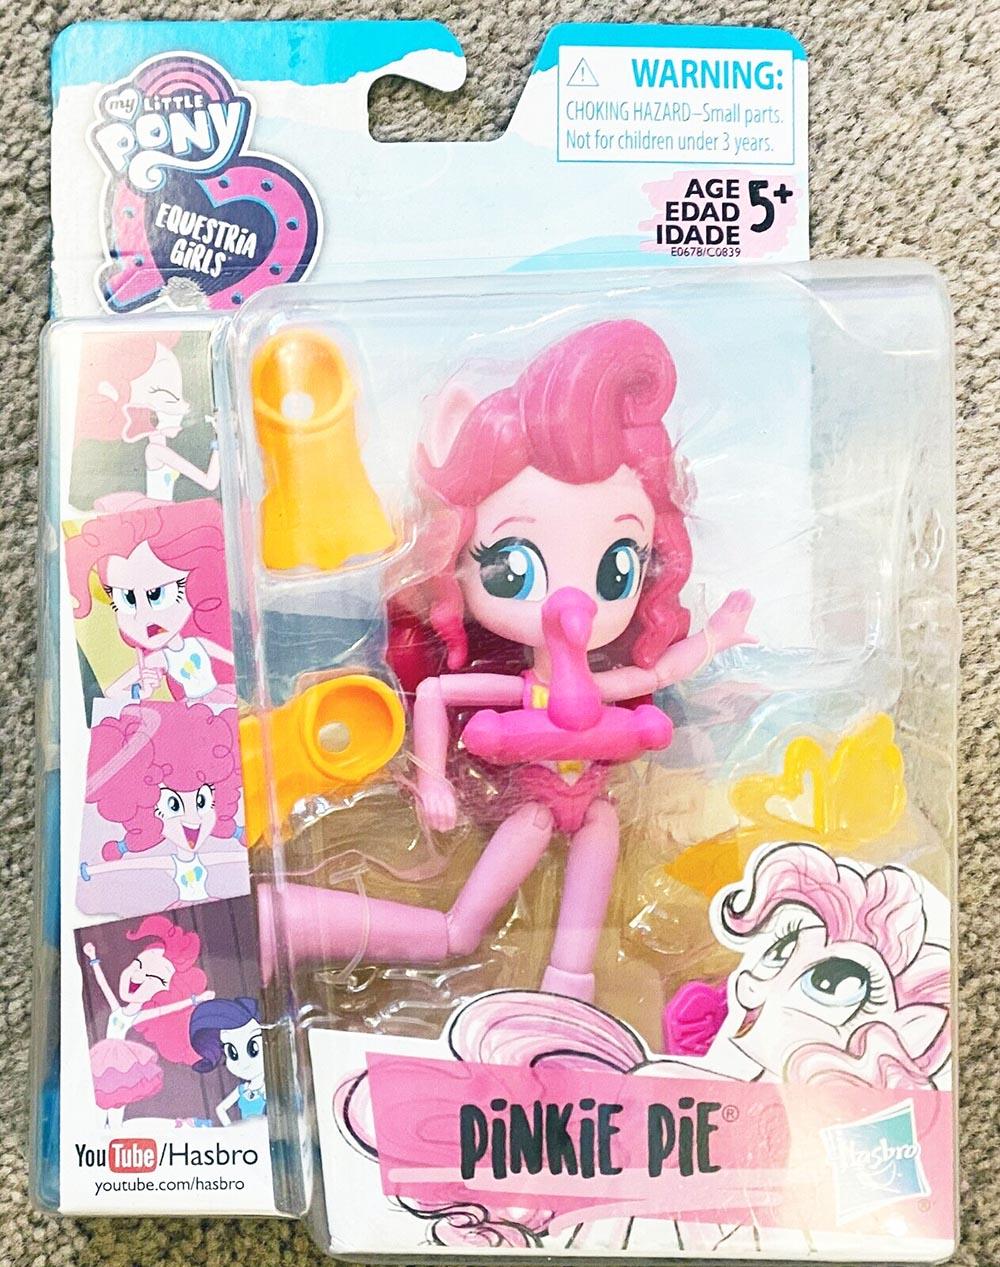 Búp bê My Little Pony cô gái Equestria trên bãi biển Beach - Pinkie Pie